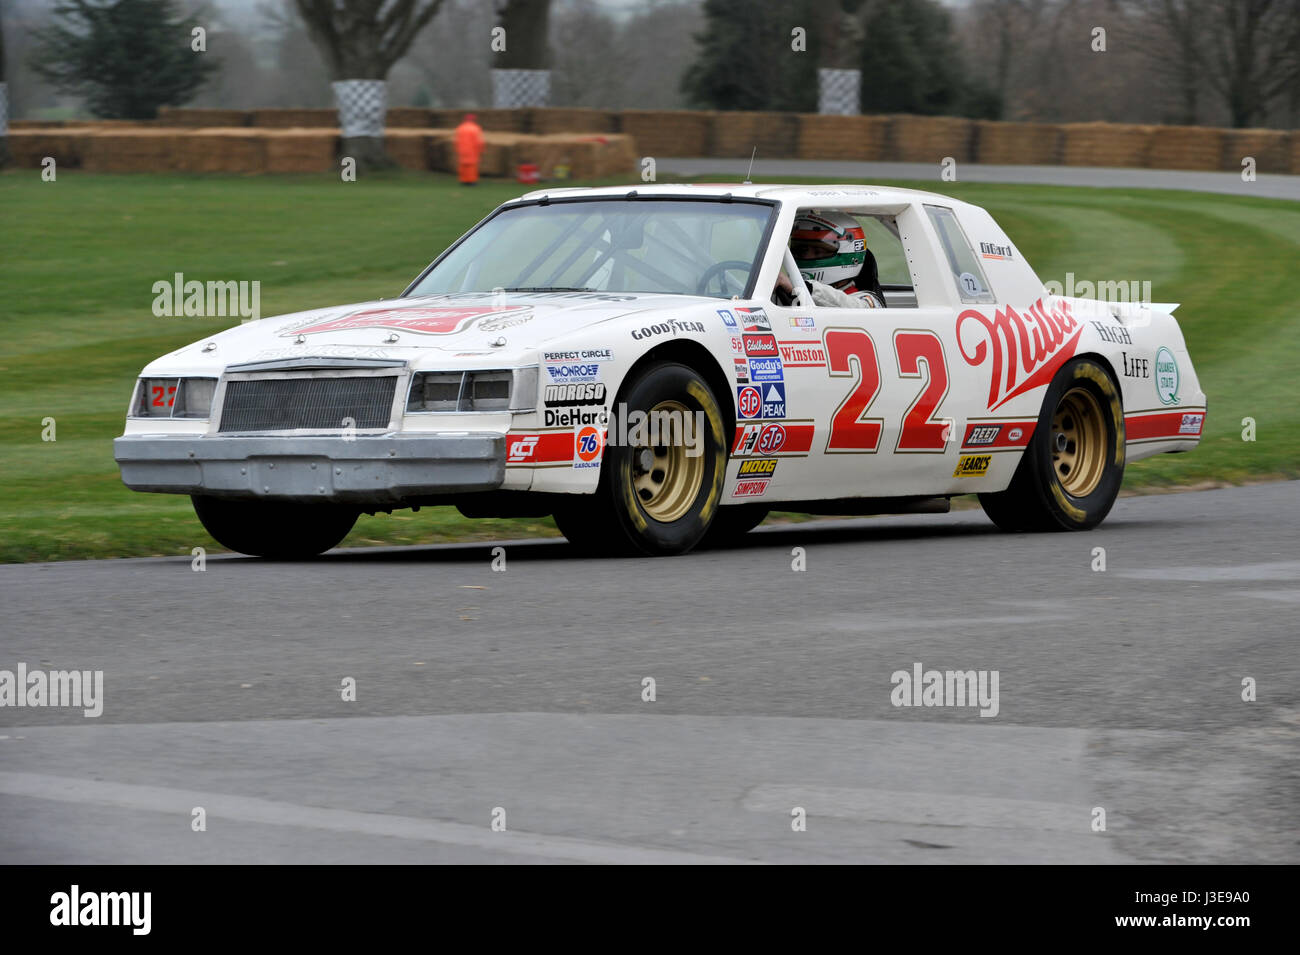 Bobby Allisons Nascar Buick Stock Photo Royalty Free - Buick stock